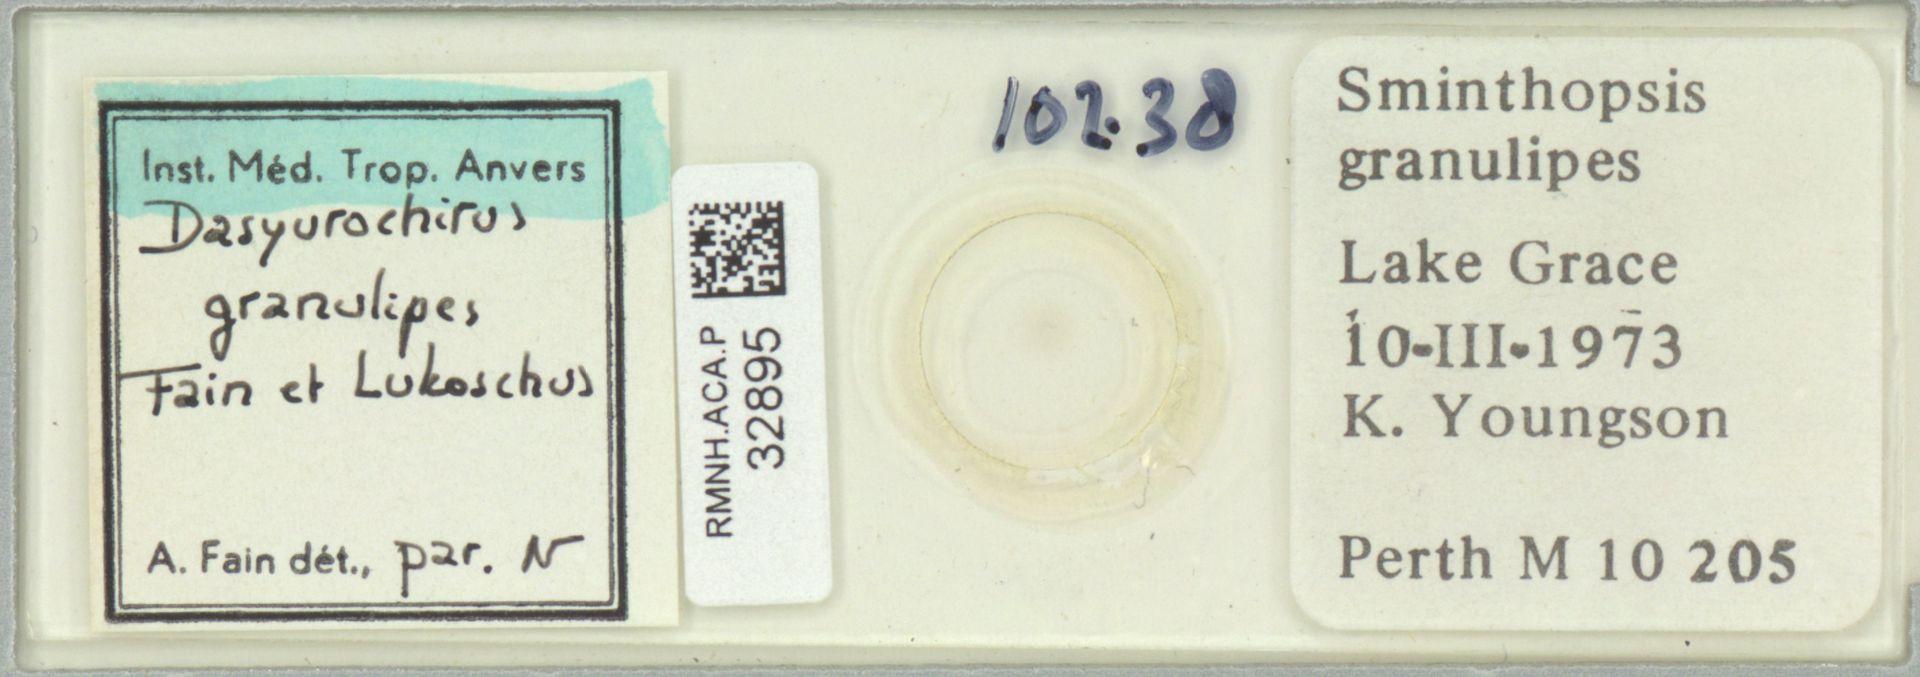 RMNH.ACA.P.32895   Dasyurochirus granulipes Fain & Lukoschus